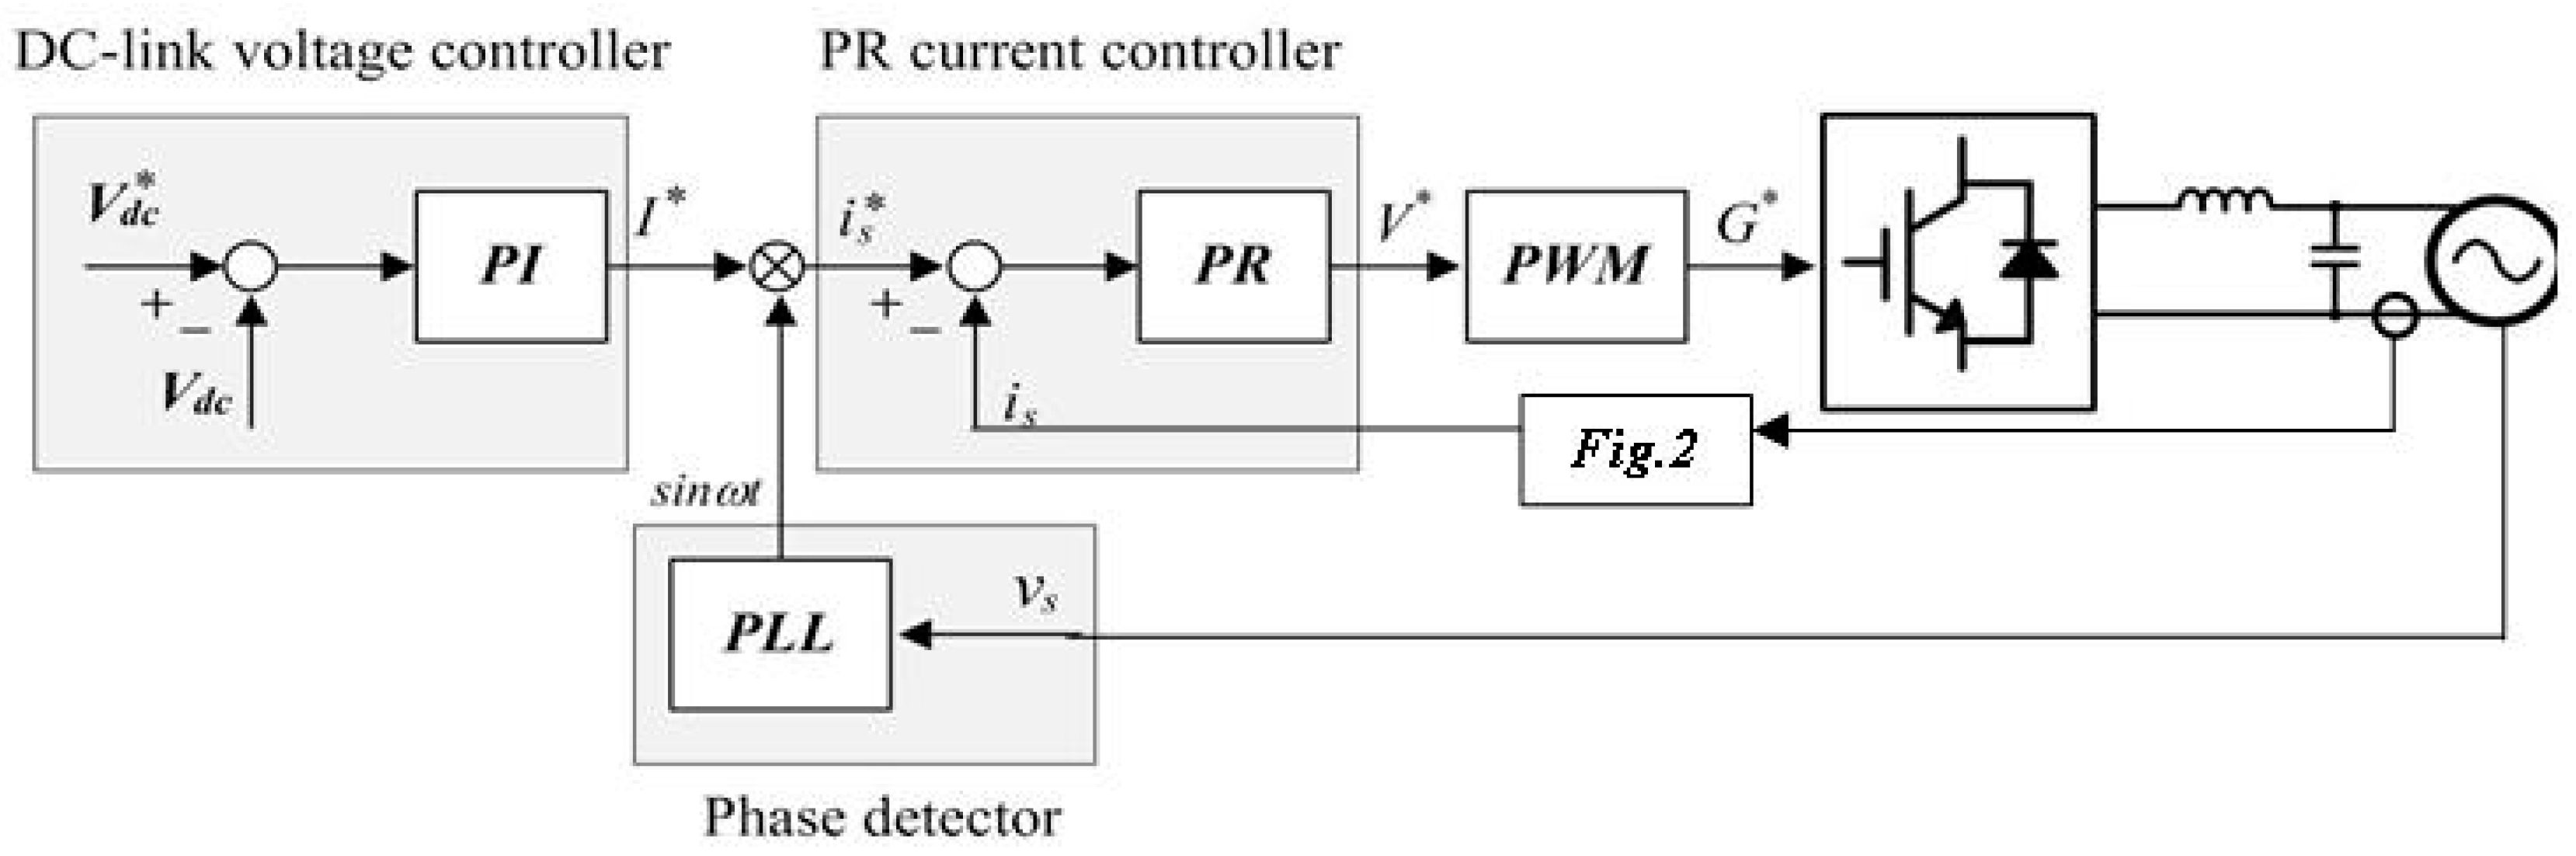 Home Wind Turbine Wire Diagram Schematic Diagrams Generator Simple Circuit Ac Current Find Wiring U2022 Water